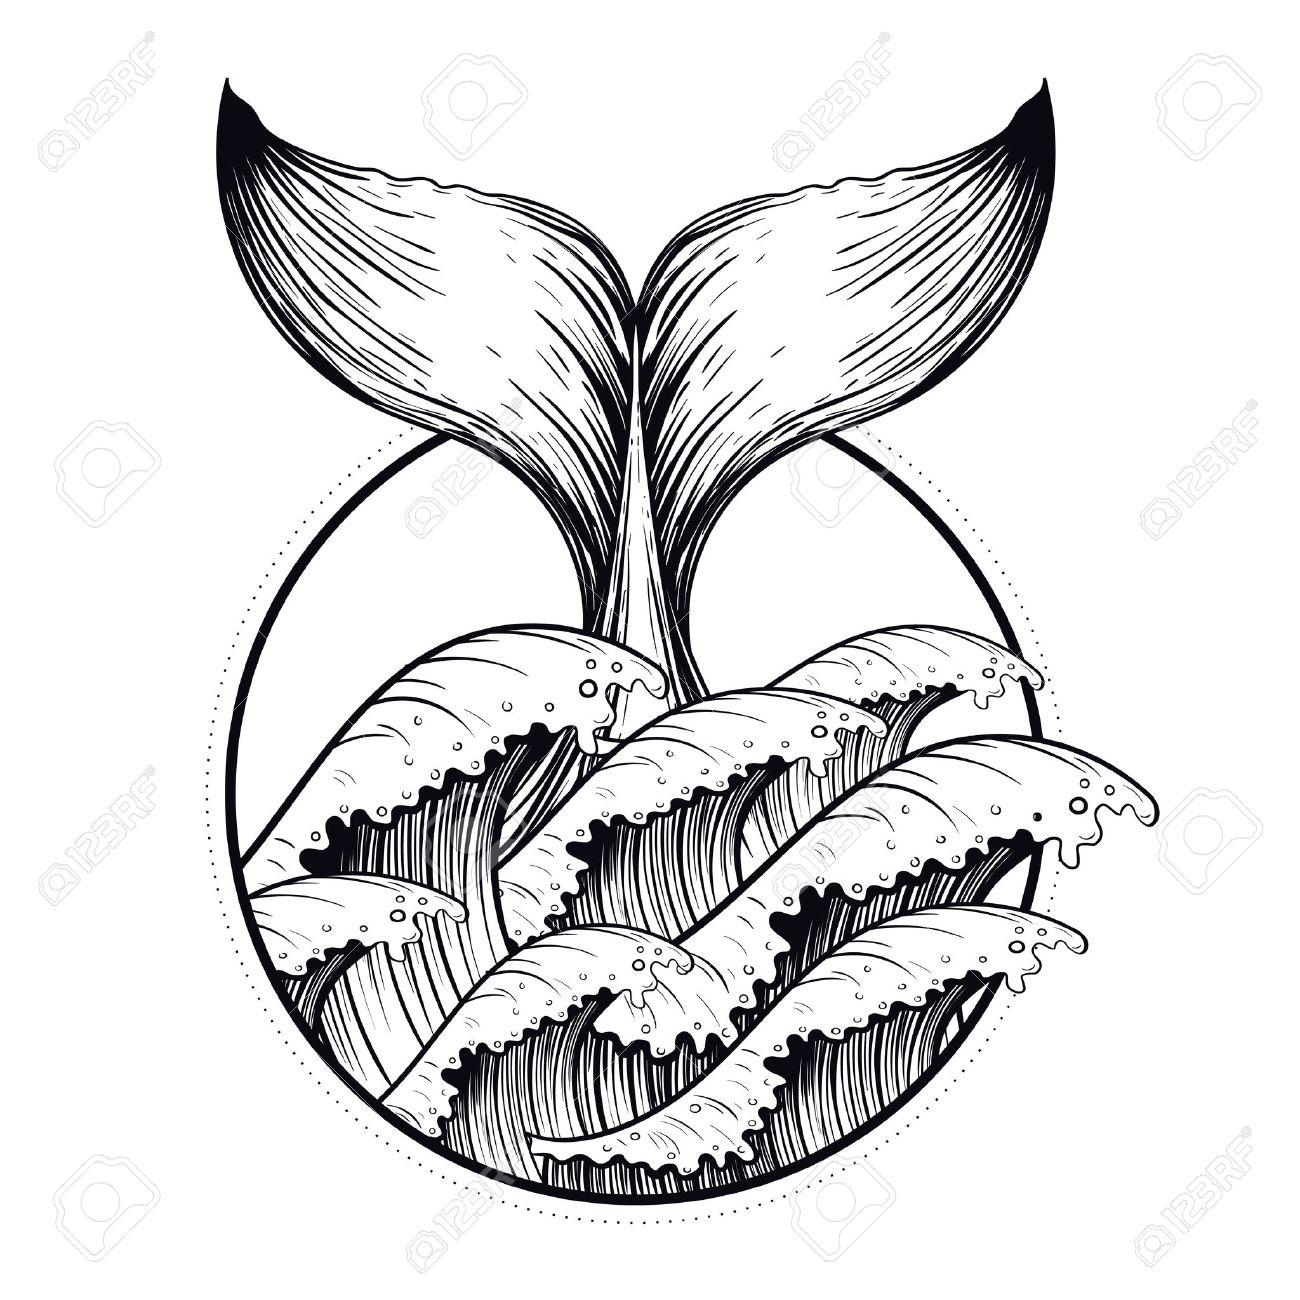 1300x1300 Whale Tail In Sea Waves, Boho Blackwork Tattoo. Ocean Line Art